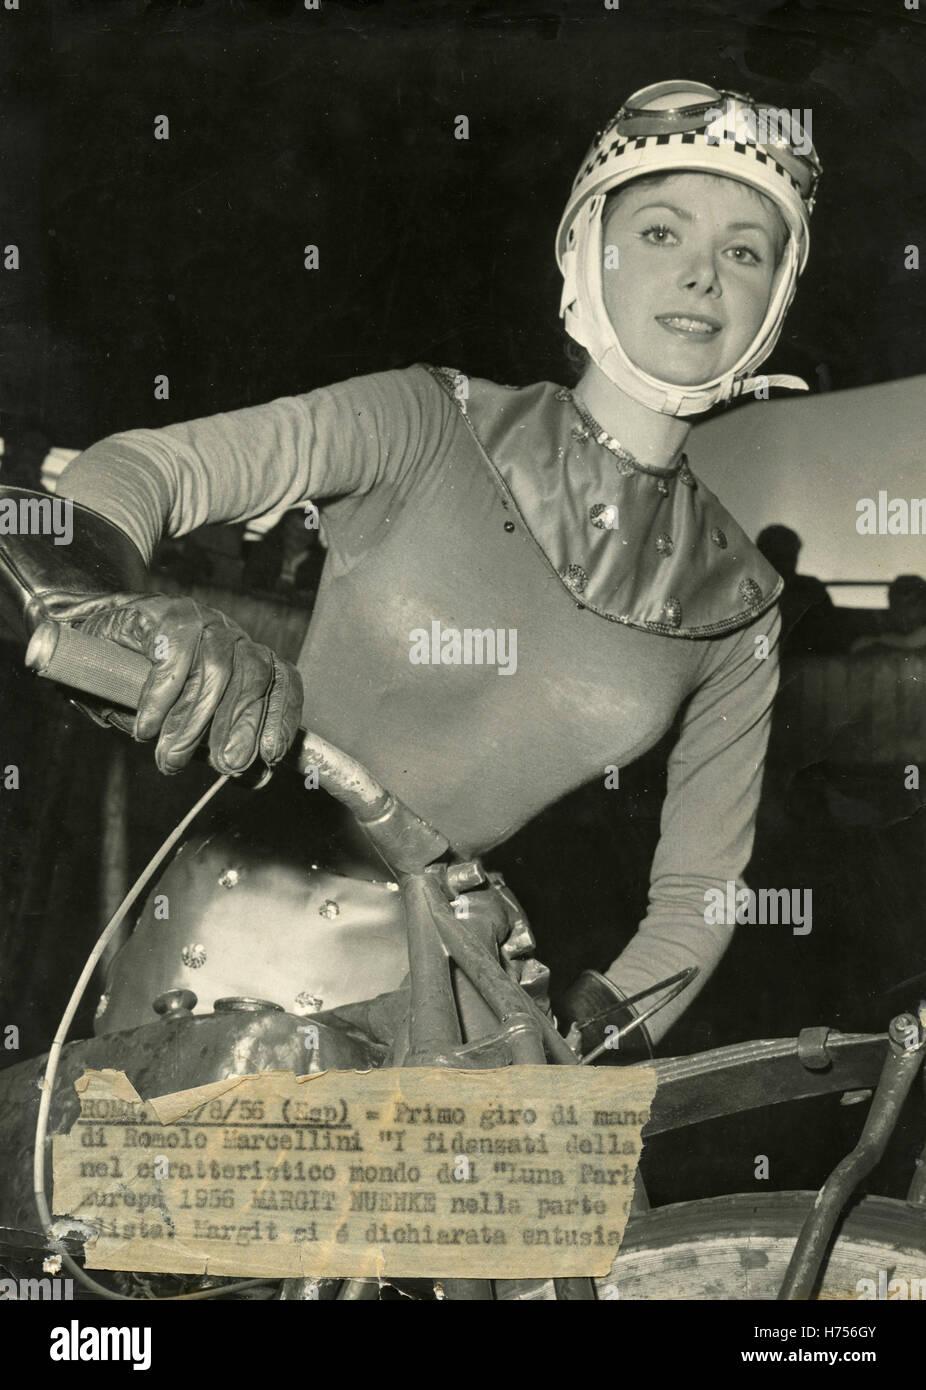 German actress Margit Nünke in the film The boyfriends of death, Italy 1956 - Stock Image